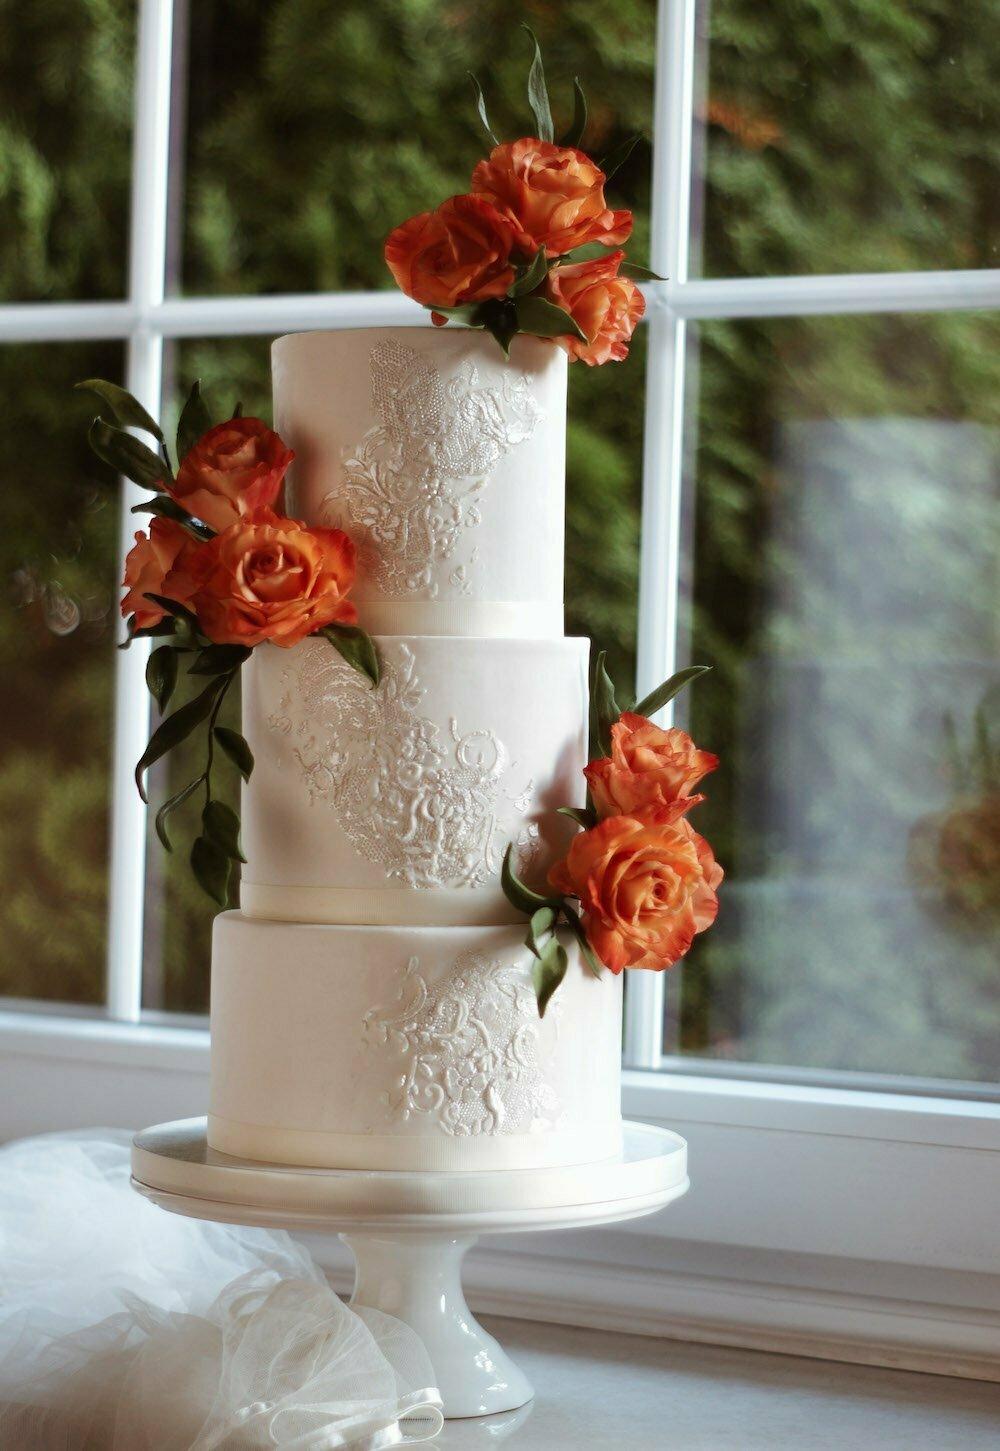 ArtOfCakeNY Gumpaste Roses Cake